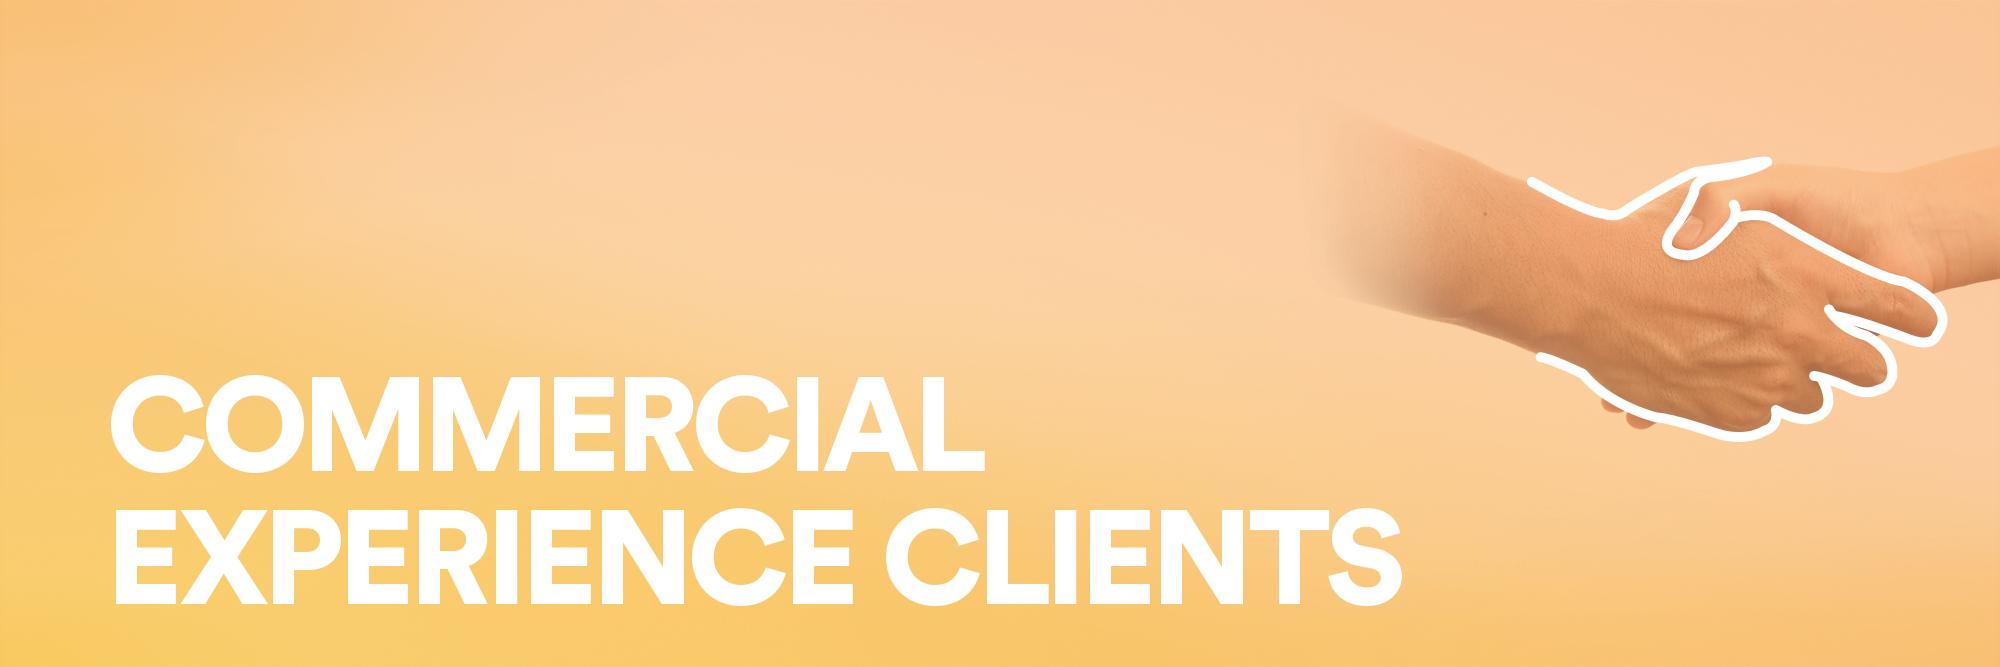 Evenements-univers-commercial-experience-clients